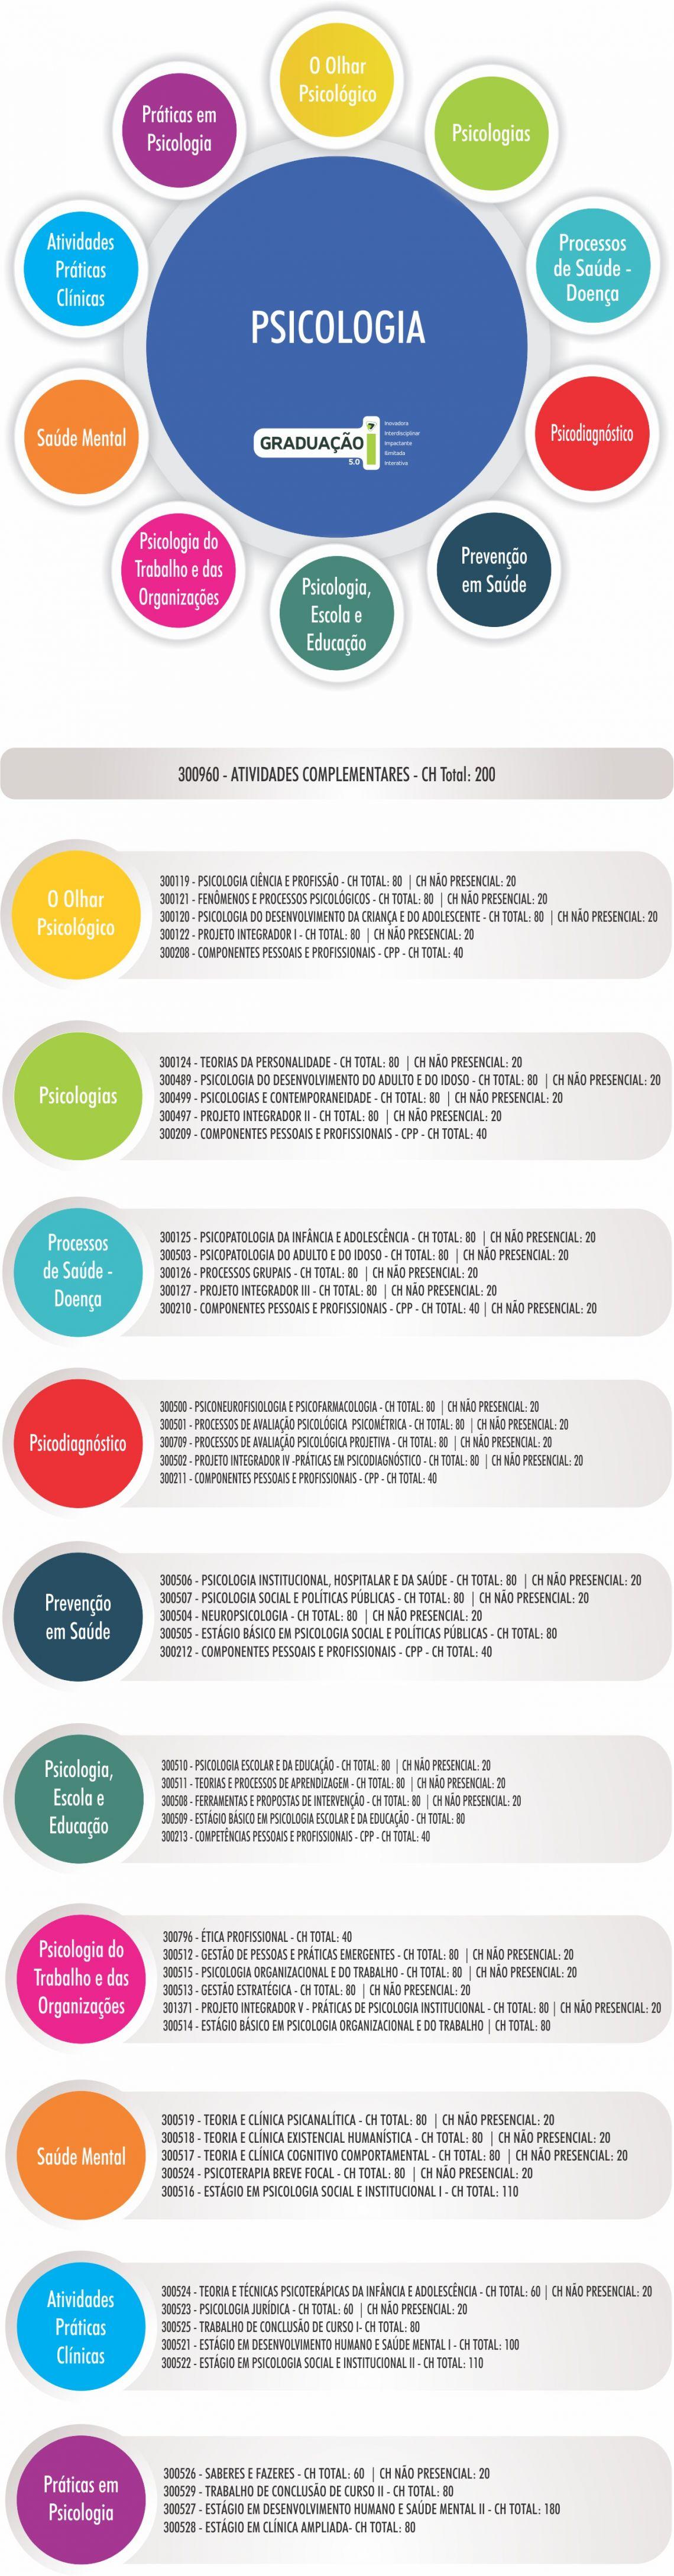 infografico_cur261350.jpg